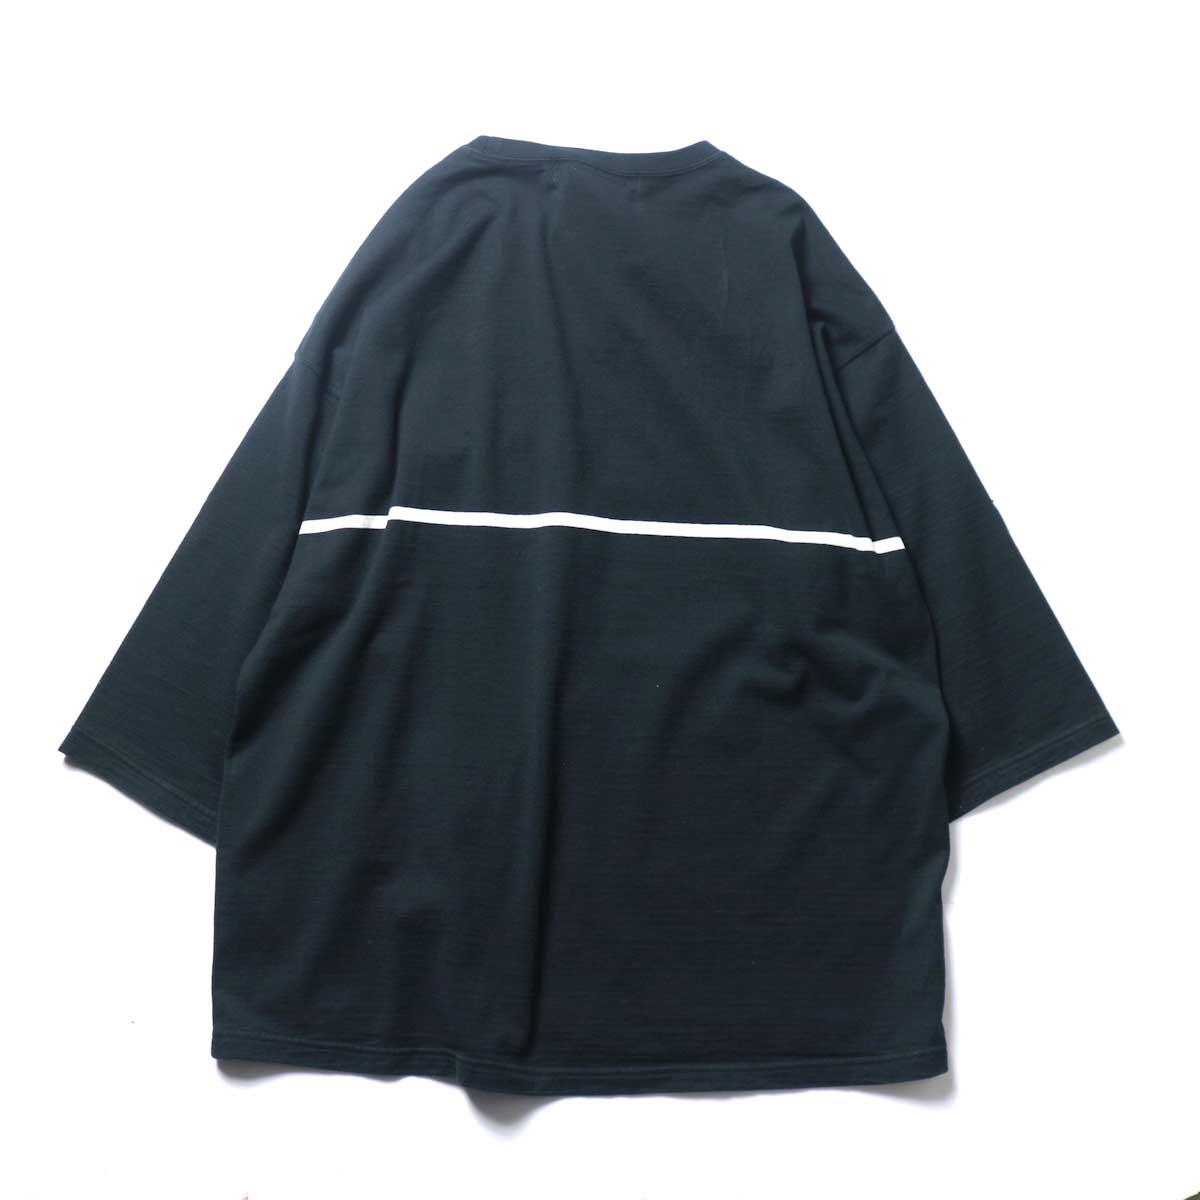 REMI RELIEF / 24Gパネル胸ボーダー七分袖 (Black)背面